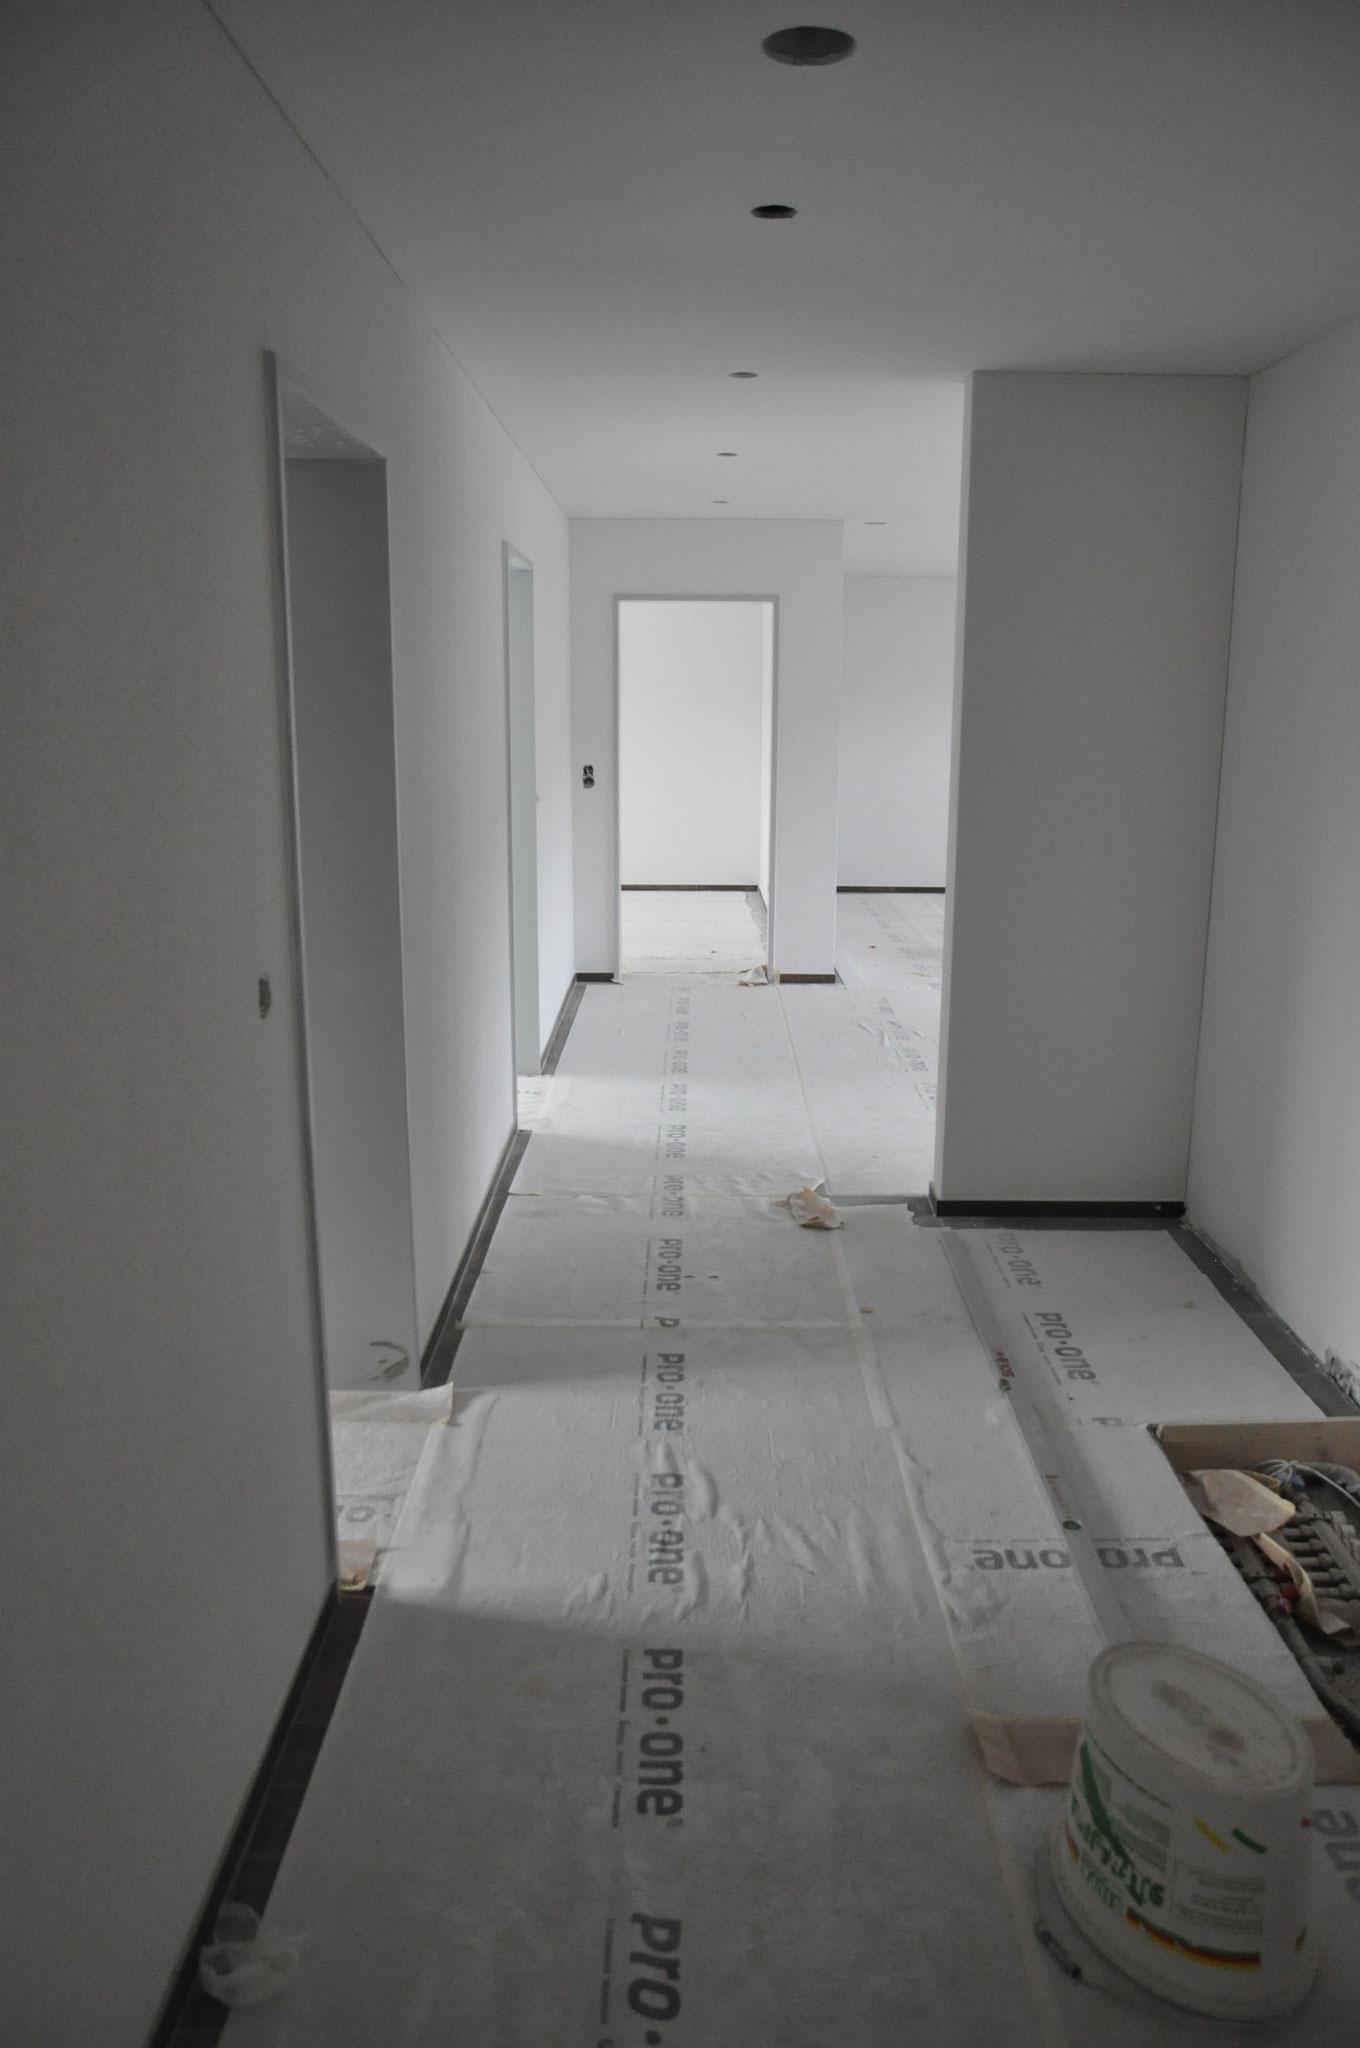 Innenausbau Gang 3,5 Zimmer Wohnung Einheit B (Mai 2016)